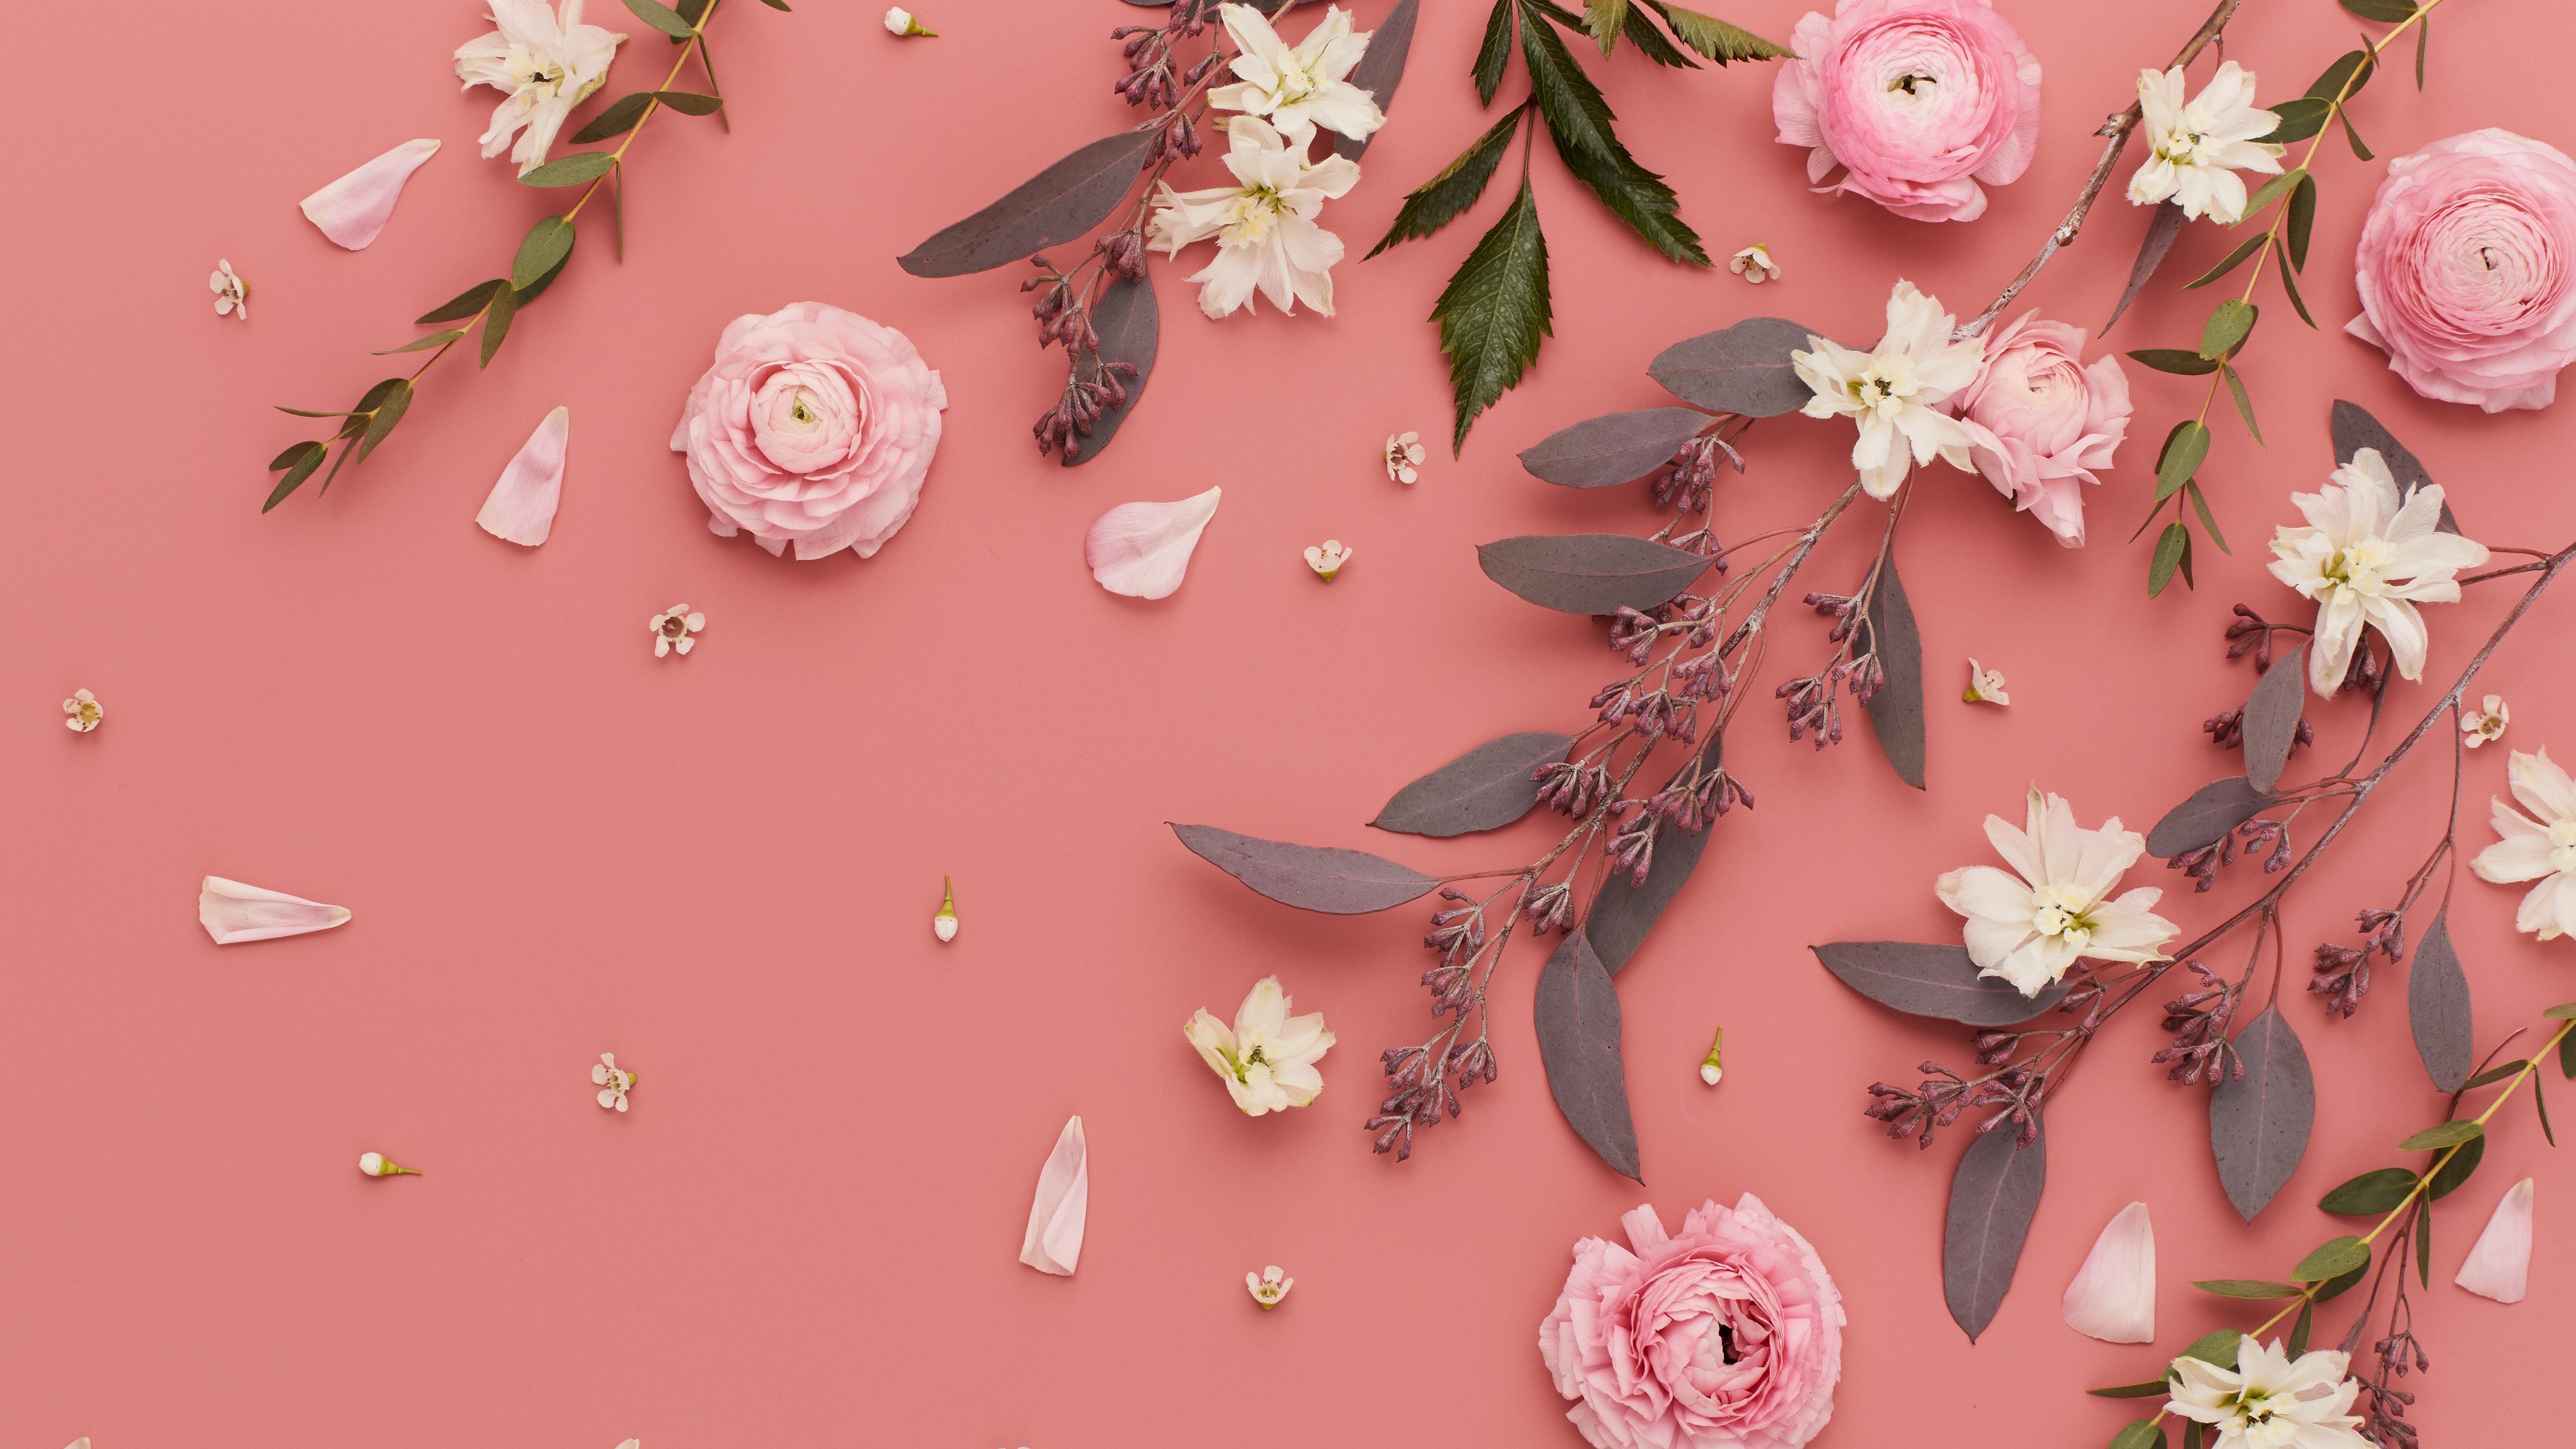 Nice   Beautiful Wallpapers Desktop Flower Background Hd 11635 5120x2880